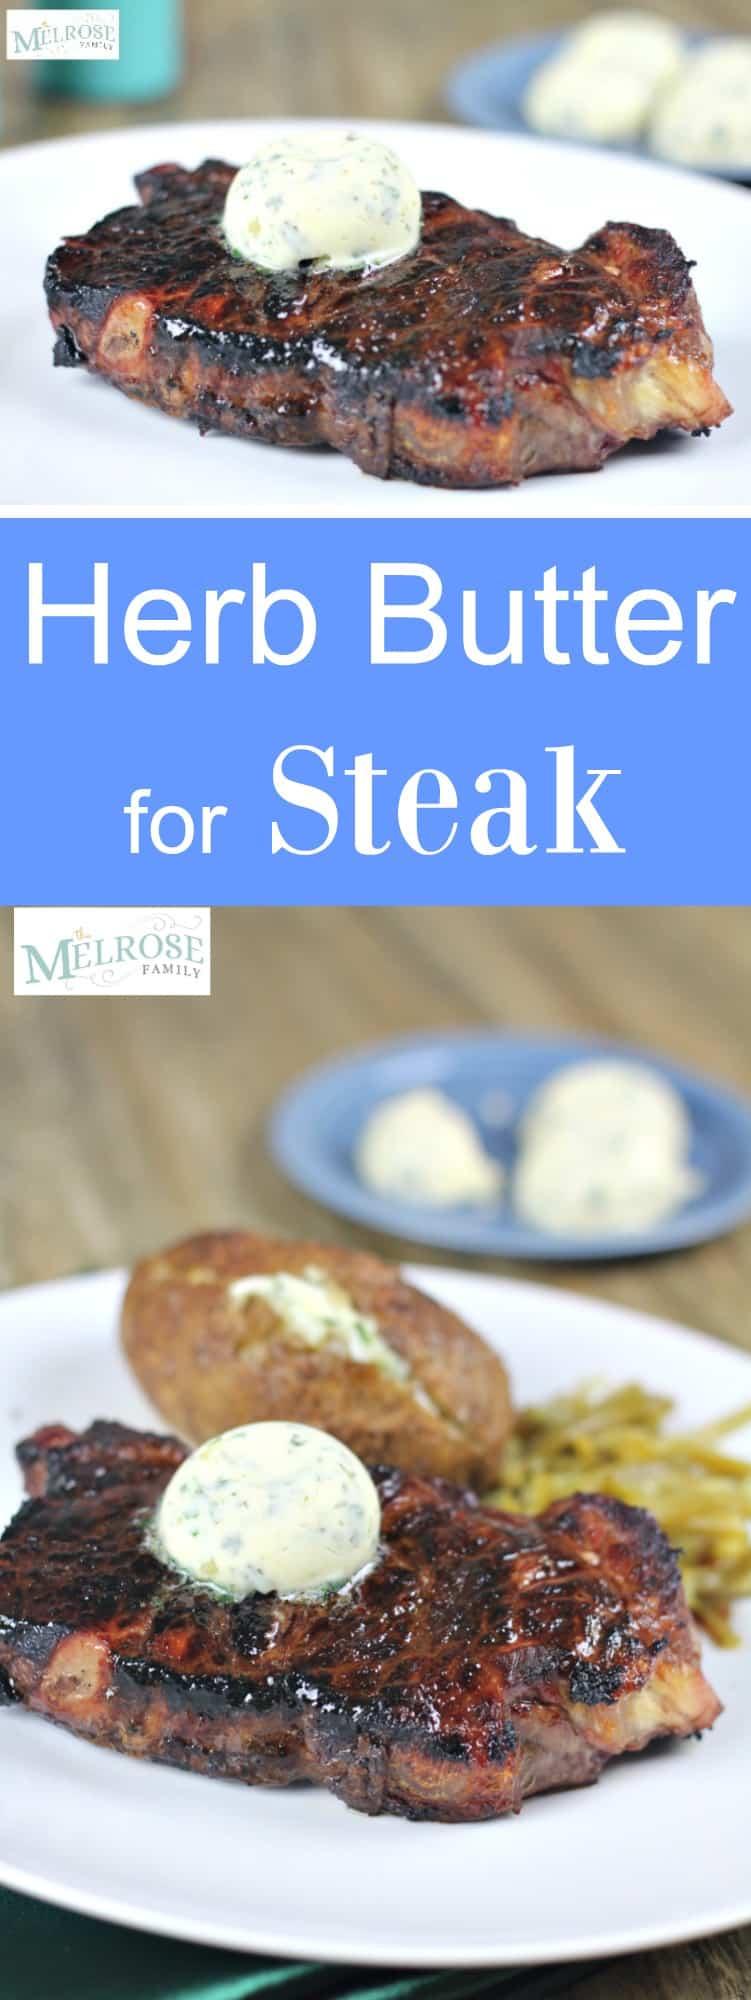 Garlic Herb Butter for Steak